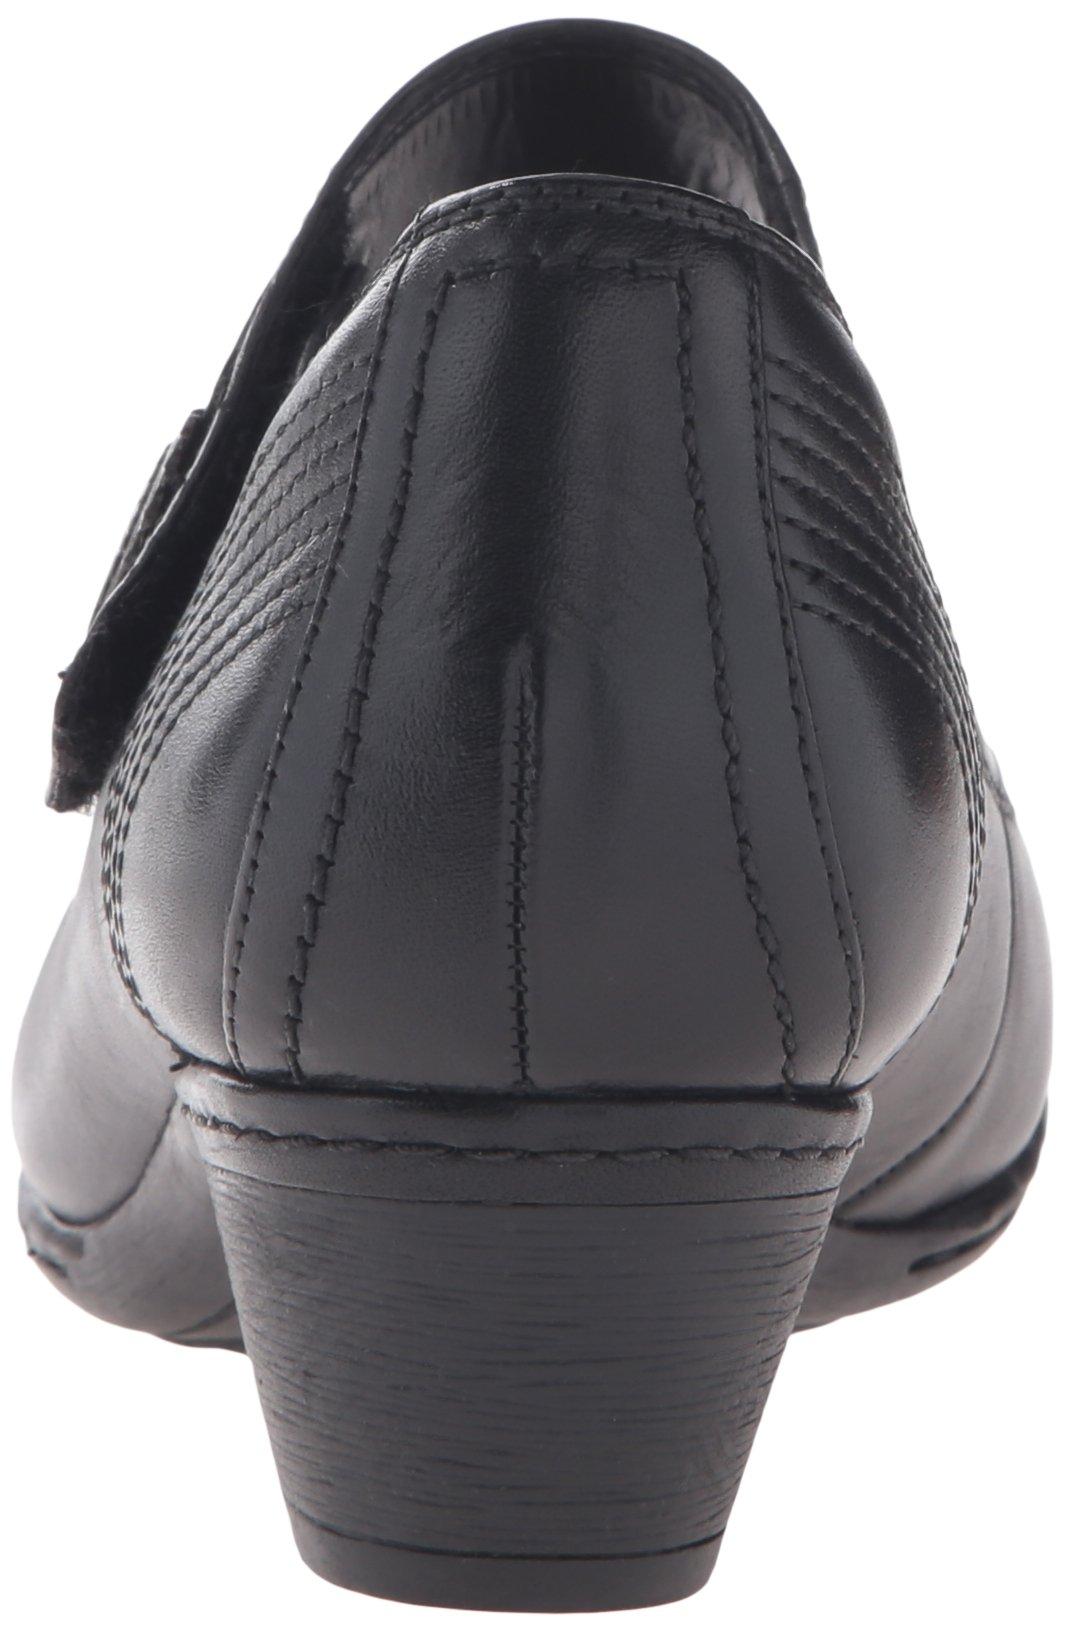 Cobb Hill Rockport Women's Abigail Dress Pump, Black, 9 N US by Cobb Hill (Image #2)